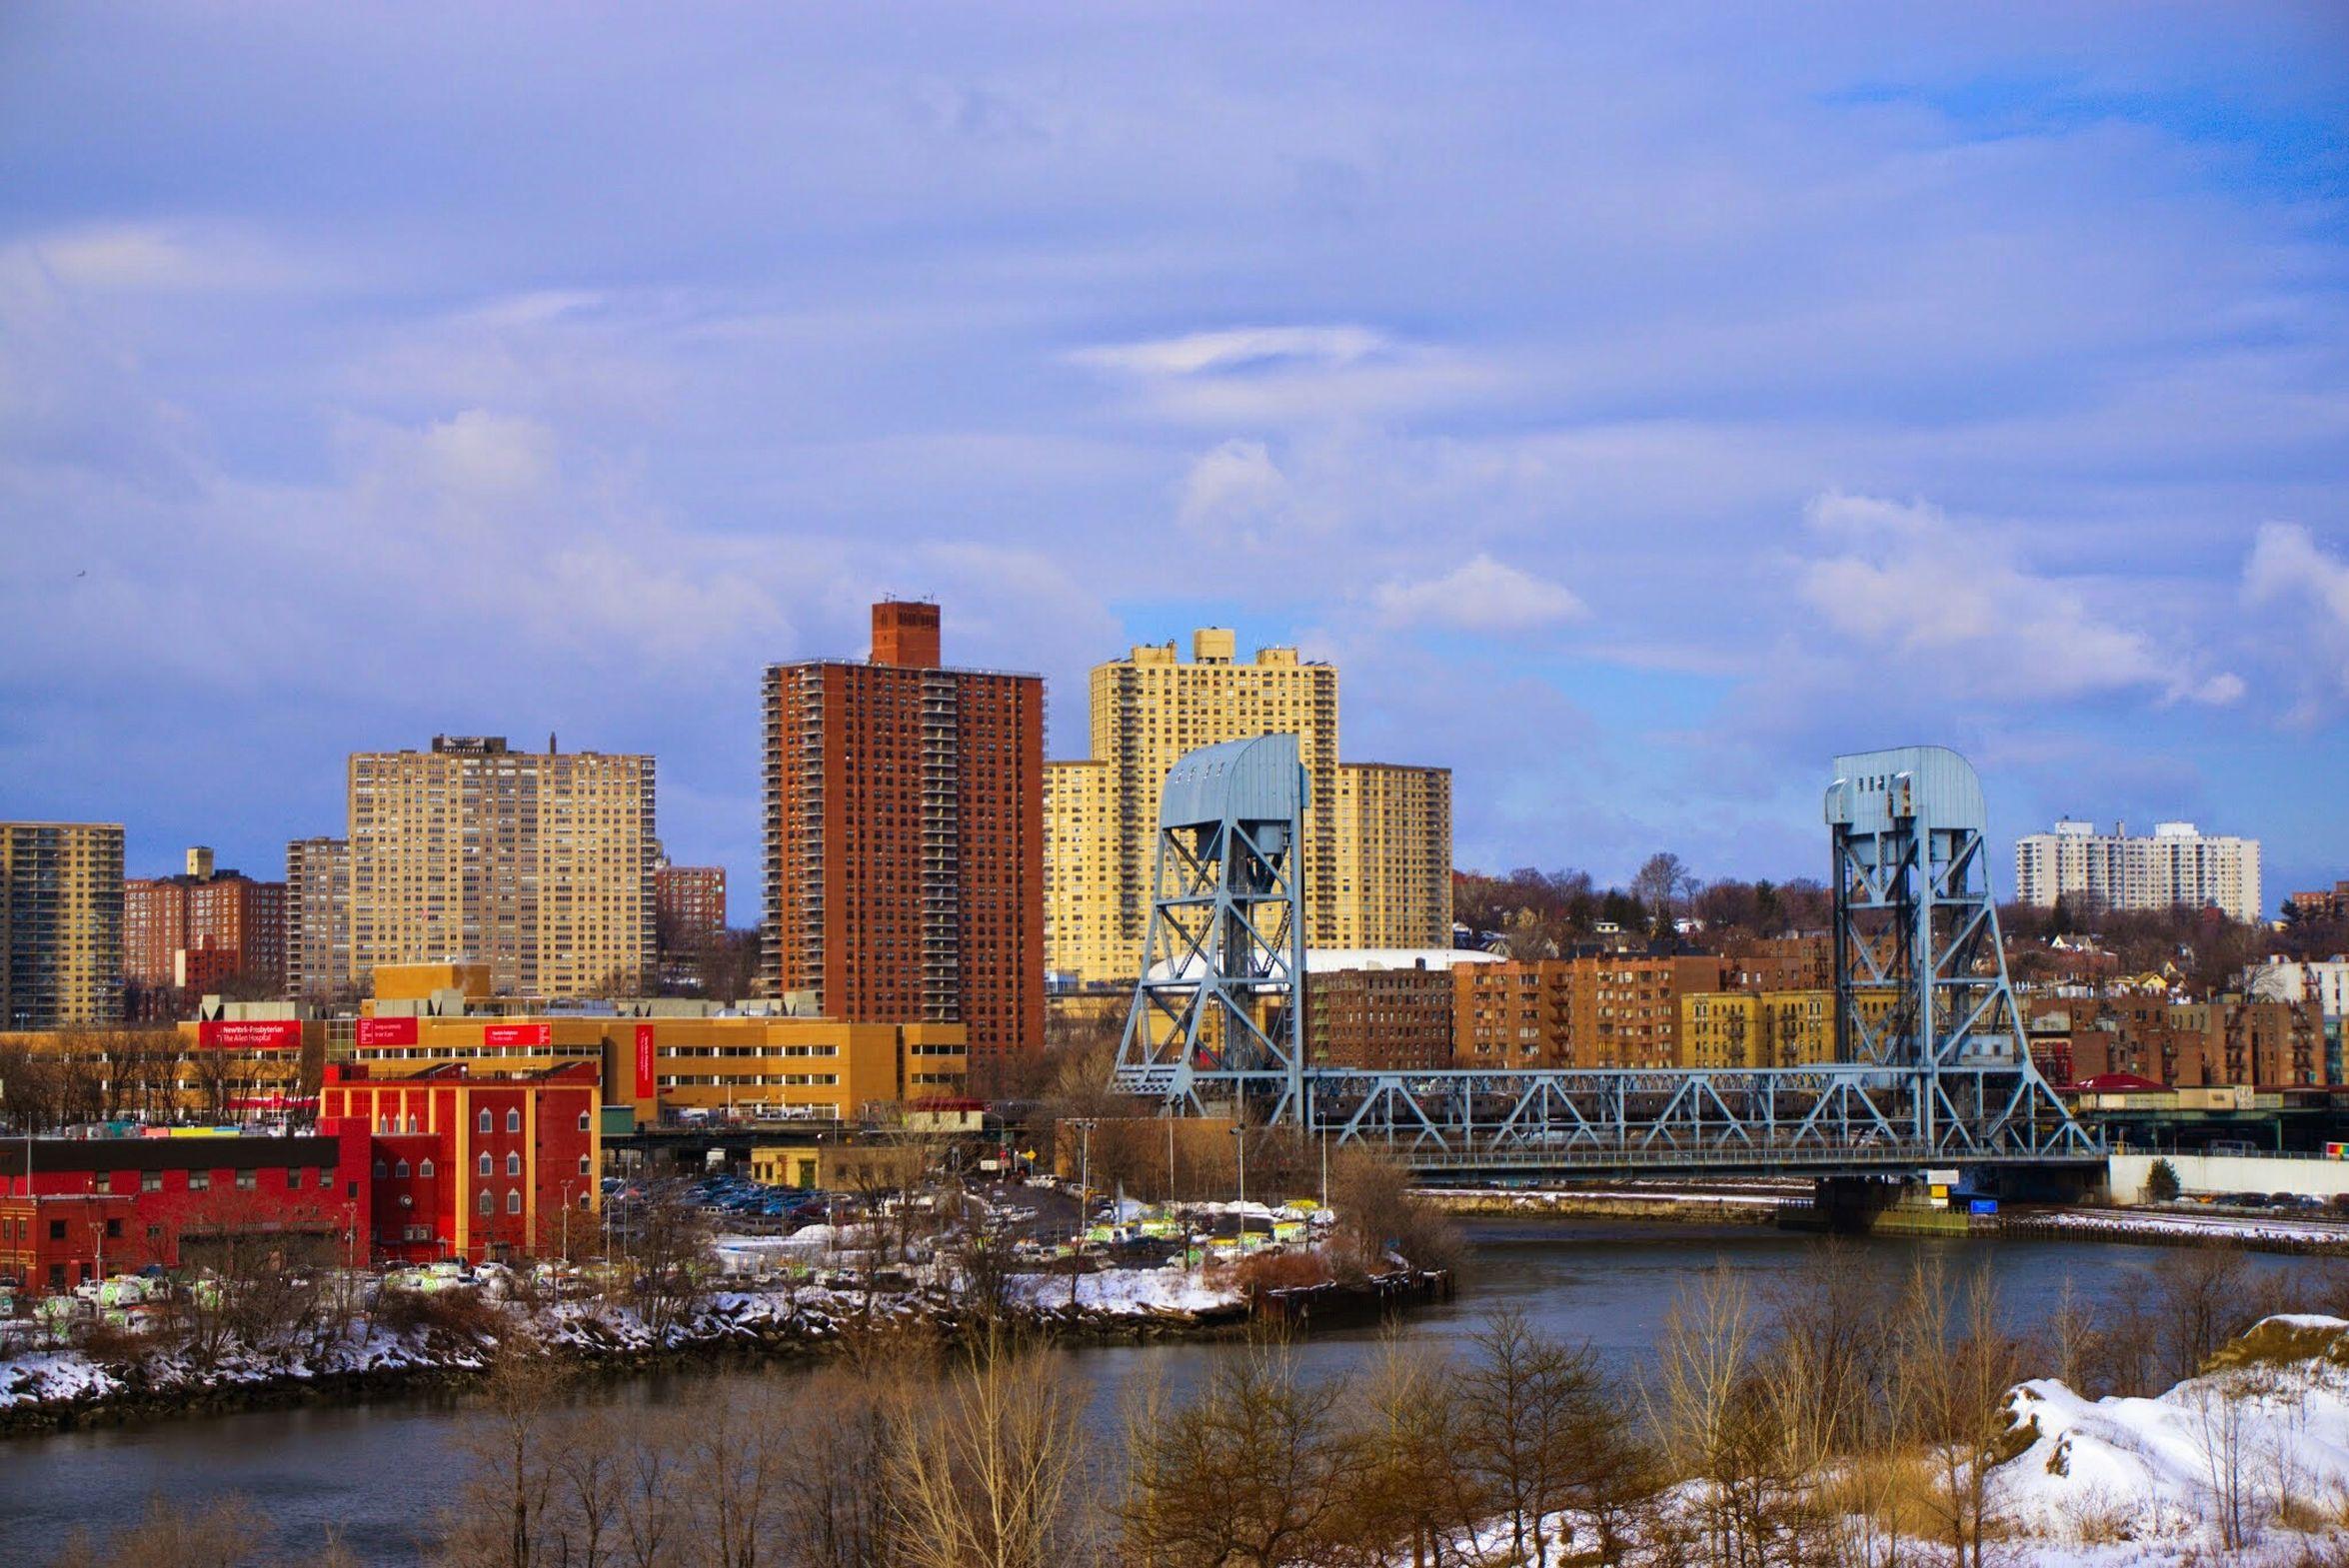 Broadway Bridge connecting Manhattan and the Bronx, crosses over the Harlem River. Bronx Manhattan NYC Bridge Harlemriver Mta